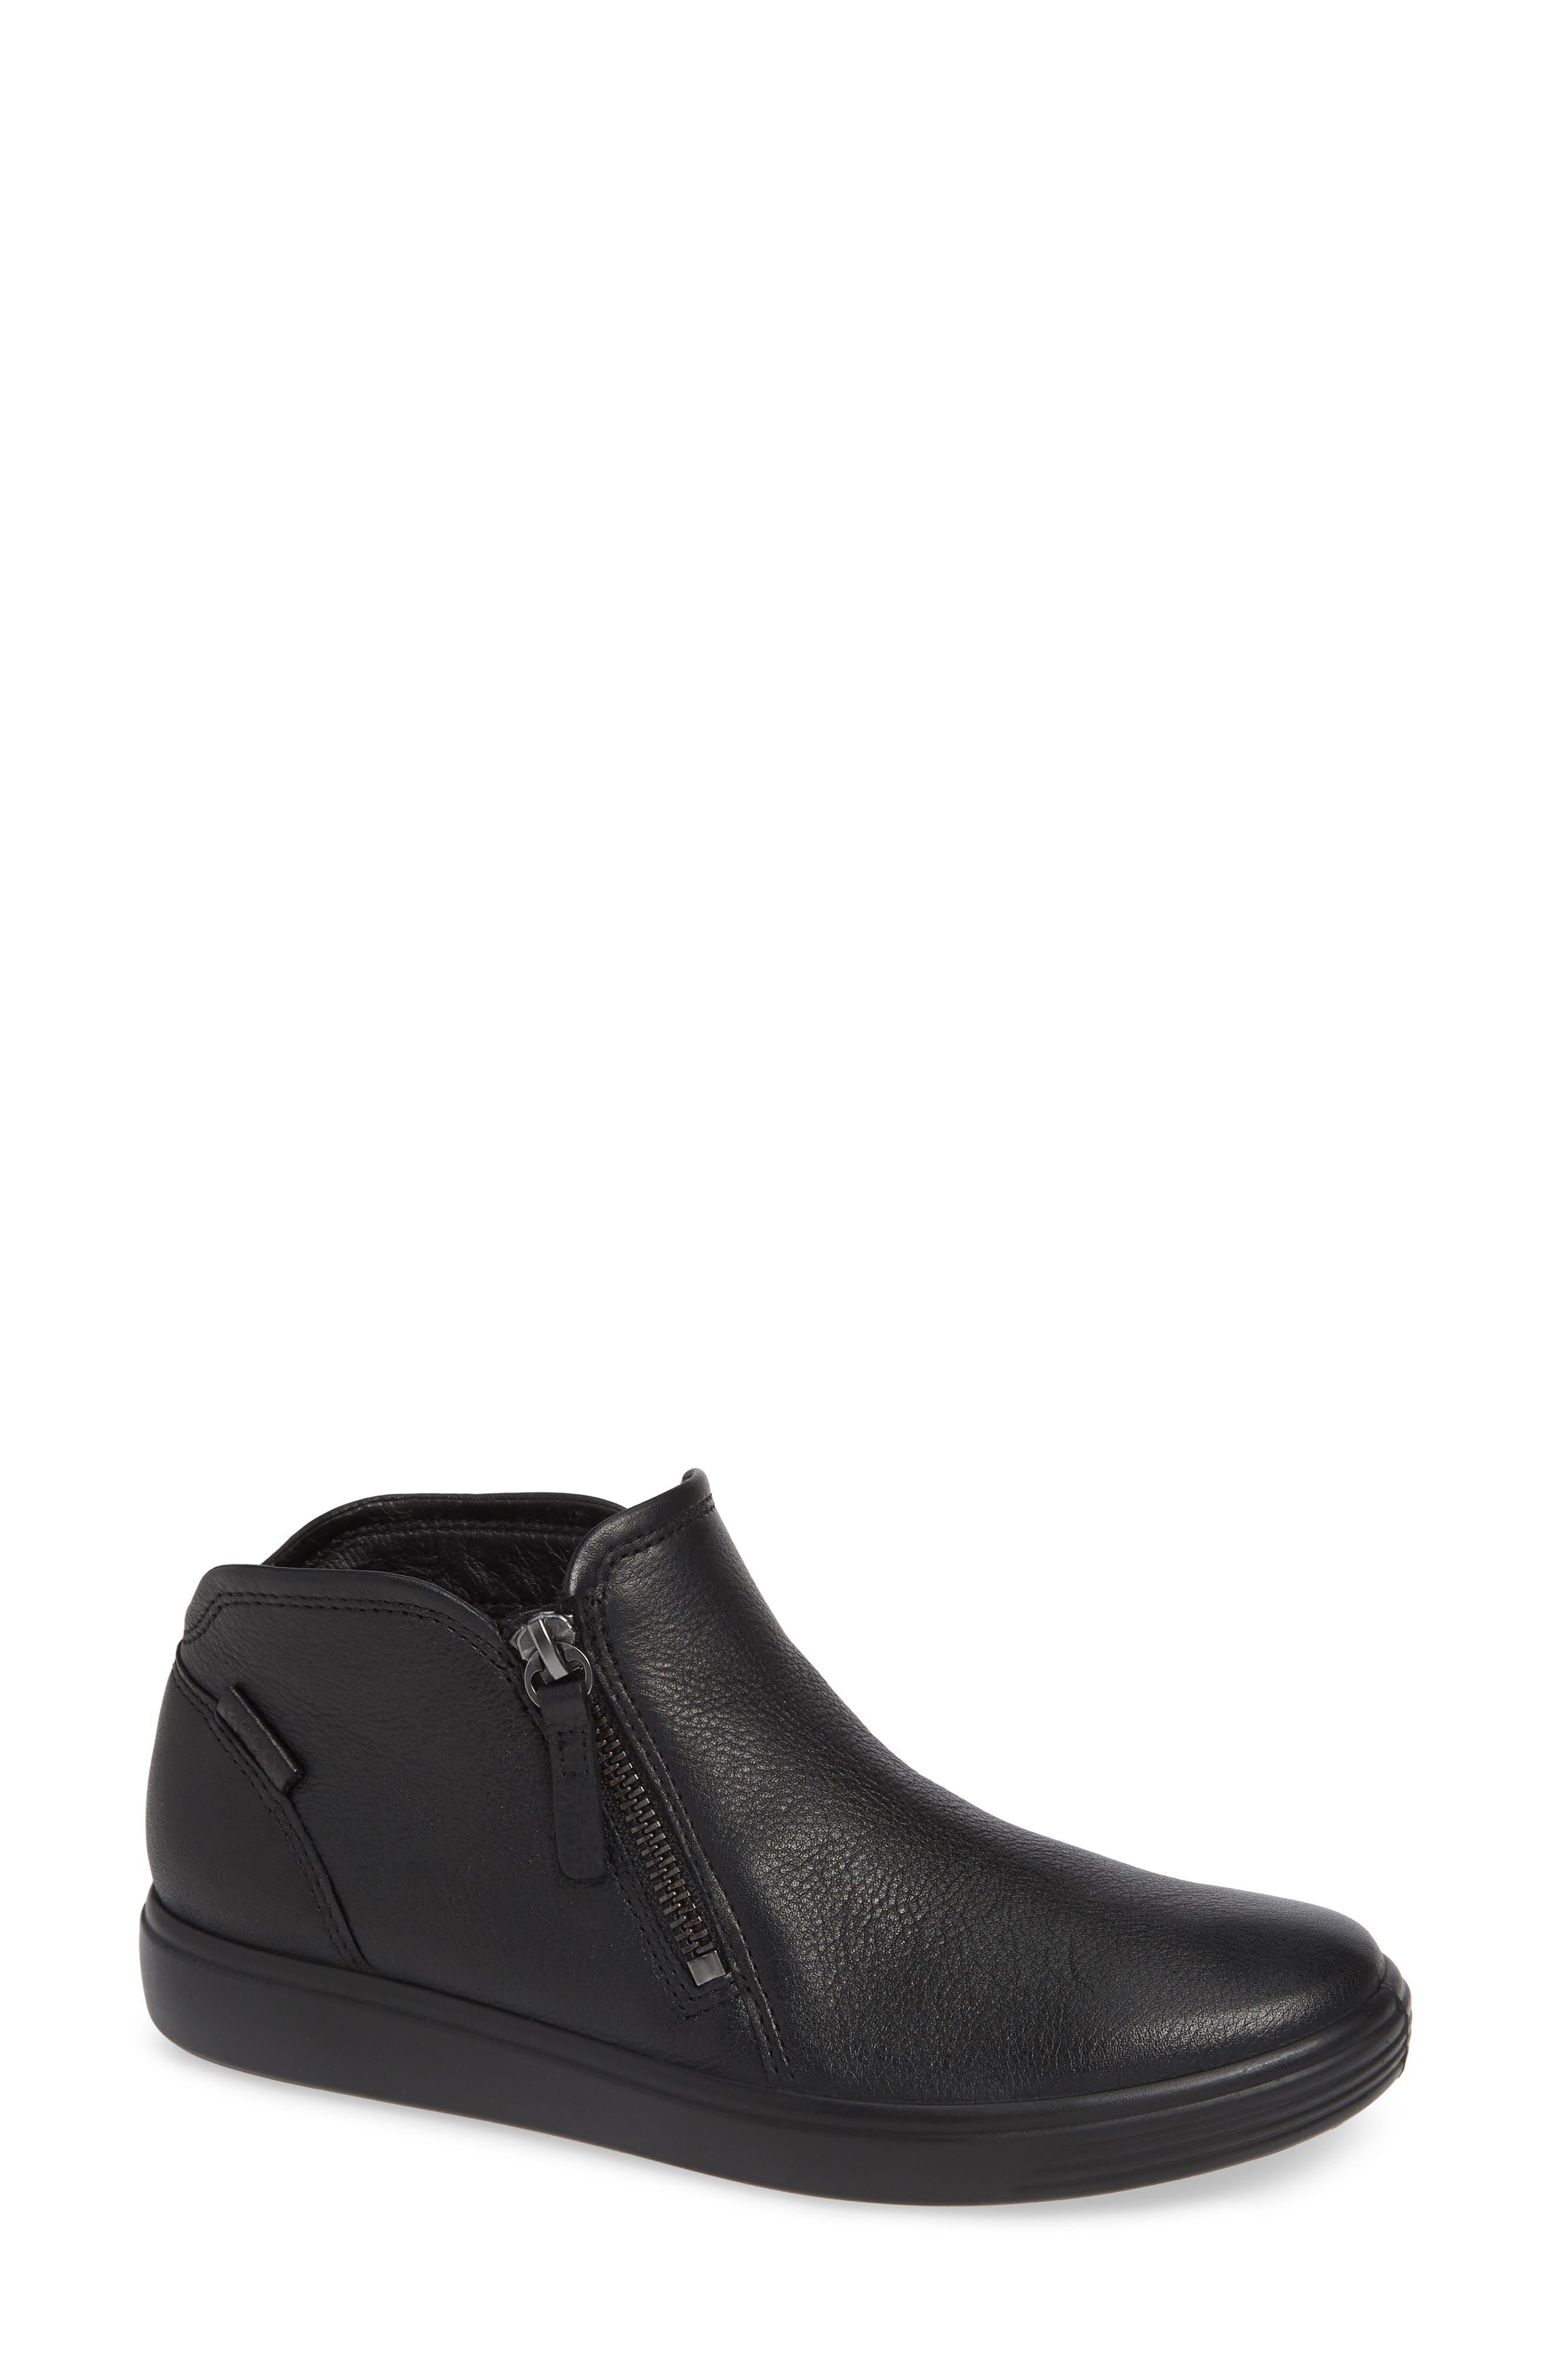 ECCO, Soft 7 Mid Top Sneaker, Main thumbnail 1, color, BLACK/ BLACK LEATHER